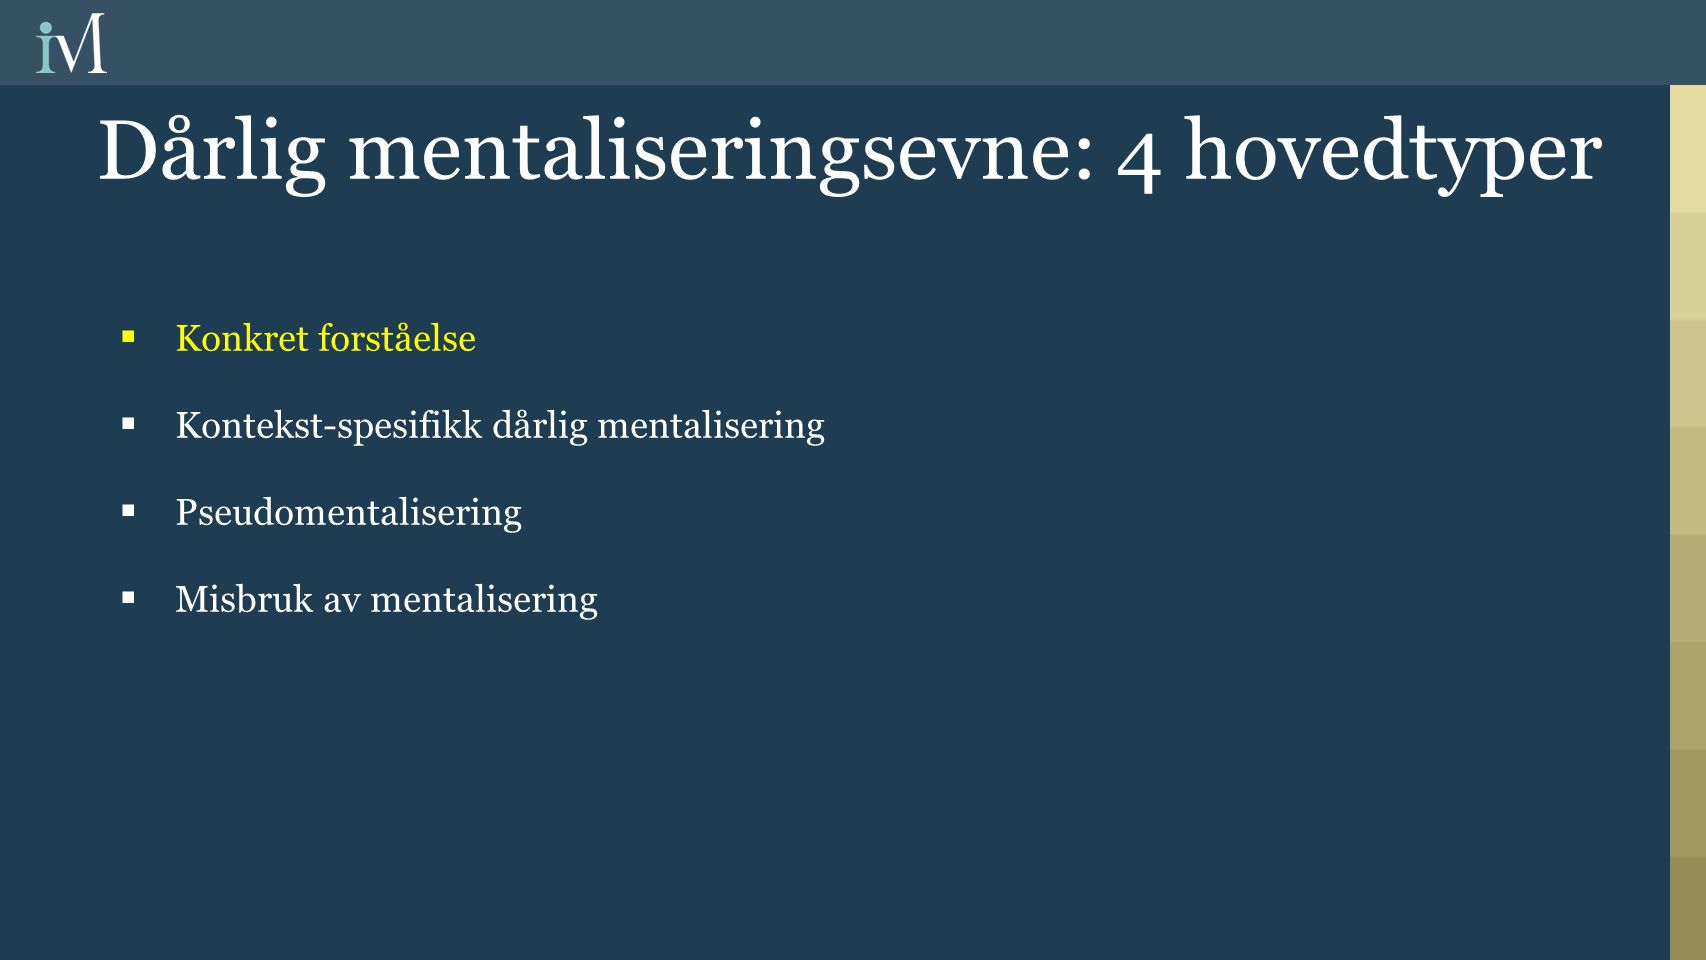 Diagnoses Axis IDepression (n=72) Anxiety (n=44) Substance Abuse (n=37) Eating disorder (n=14) 3.8 (1.7)3.5(1.8)3.4(1.8)2.8 (1.7)* Axis IINo Axis II (n=23) BPD(DSM)Antisocial or Paranoid (n=22) Other (n=38) 4.3 (1.7)*2.7 (1.6)***3.9 (1.8)3.3 (1.7) Reflekterende funksjon The Cassel hospital study (Fonagy et al., 1996)